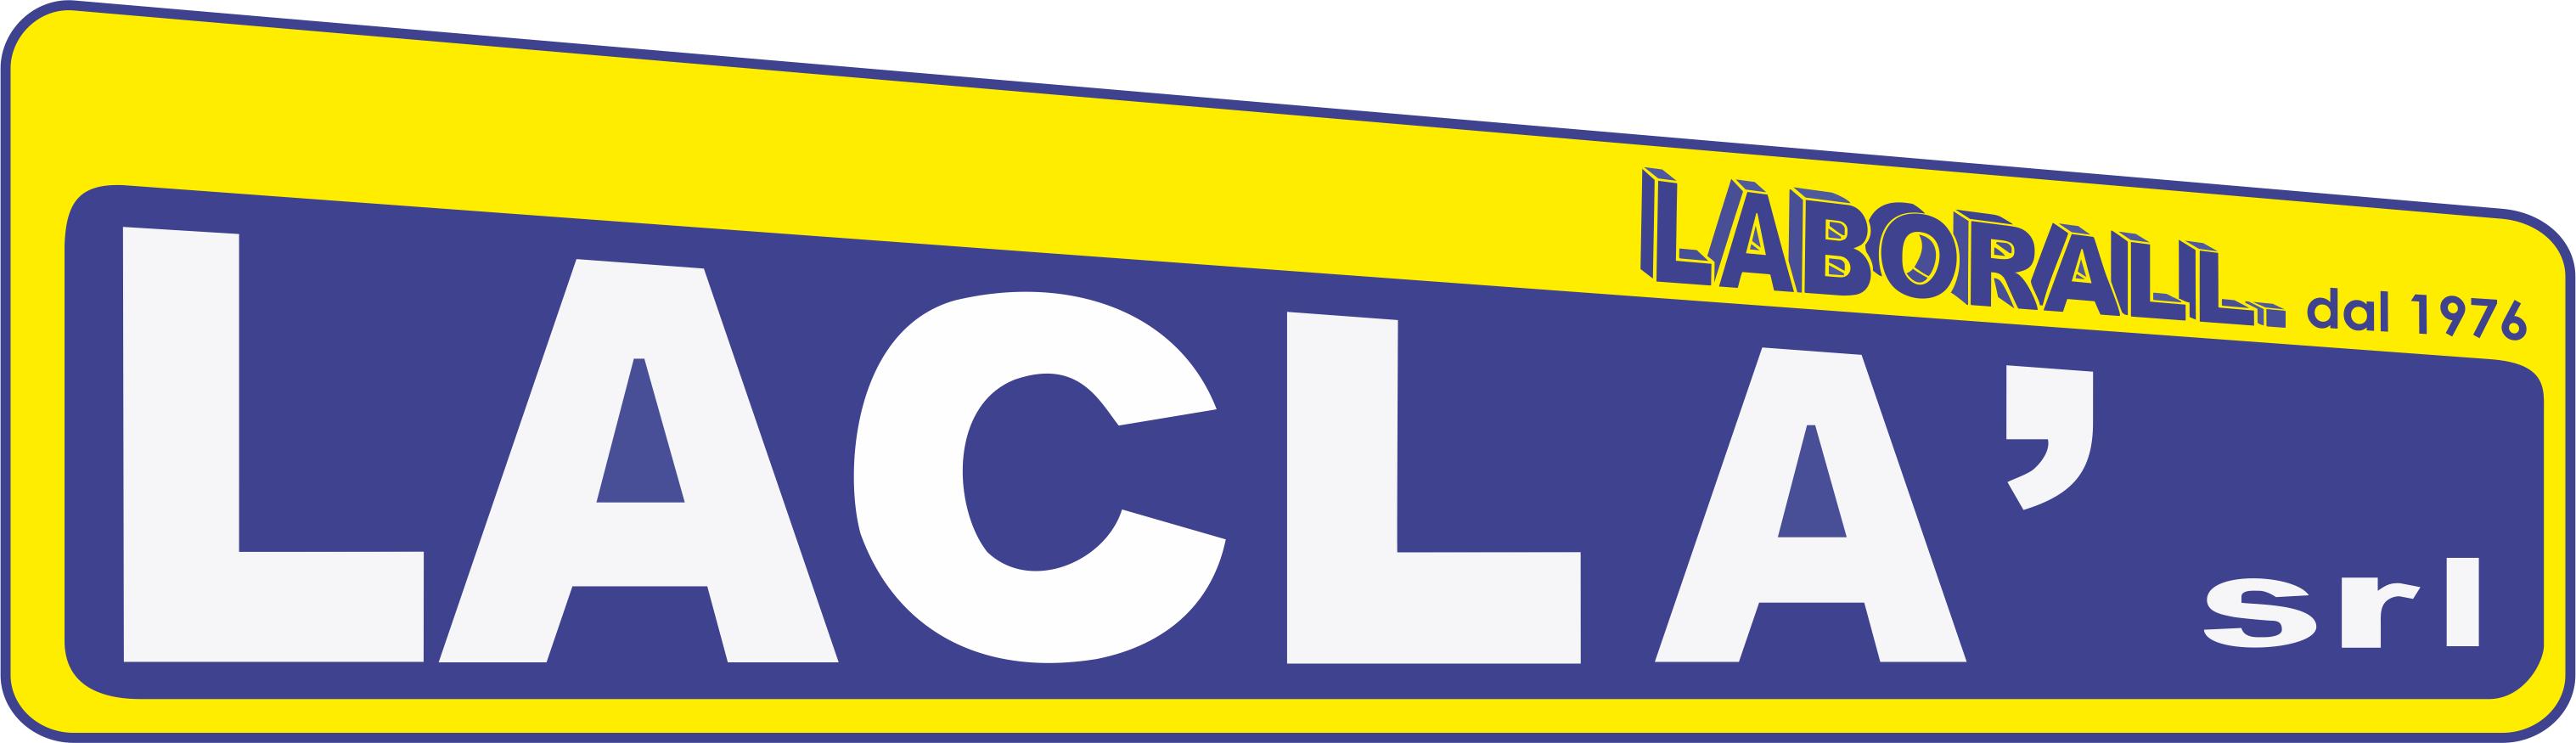 LaCla srl